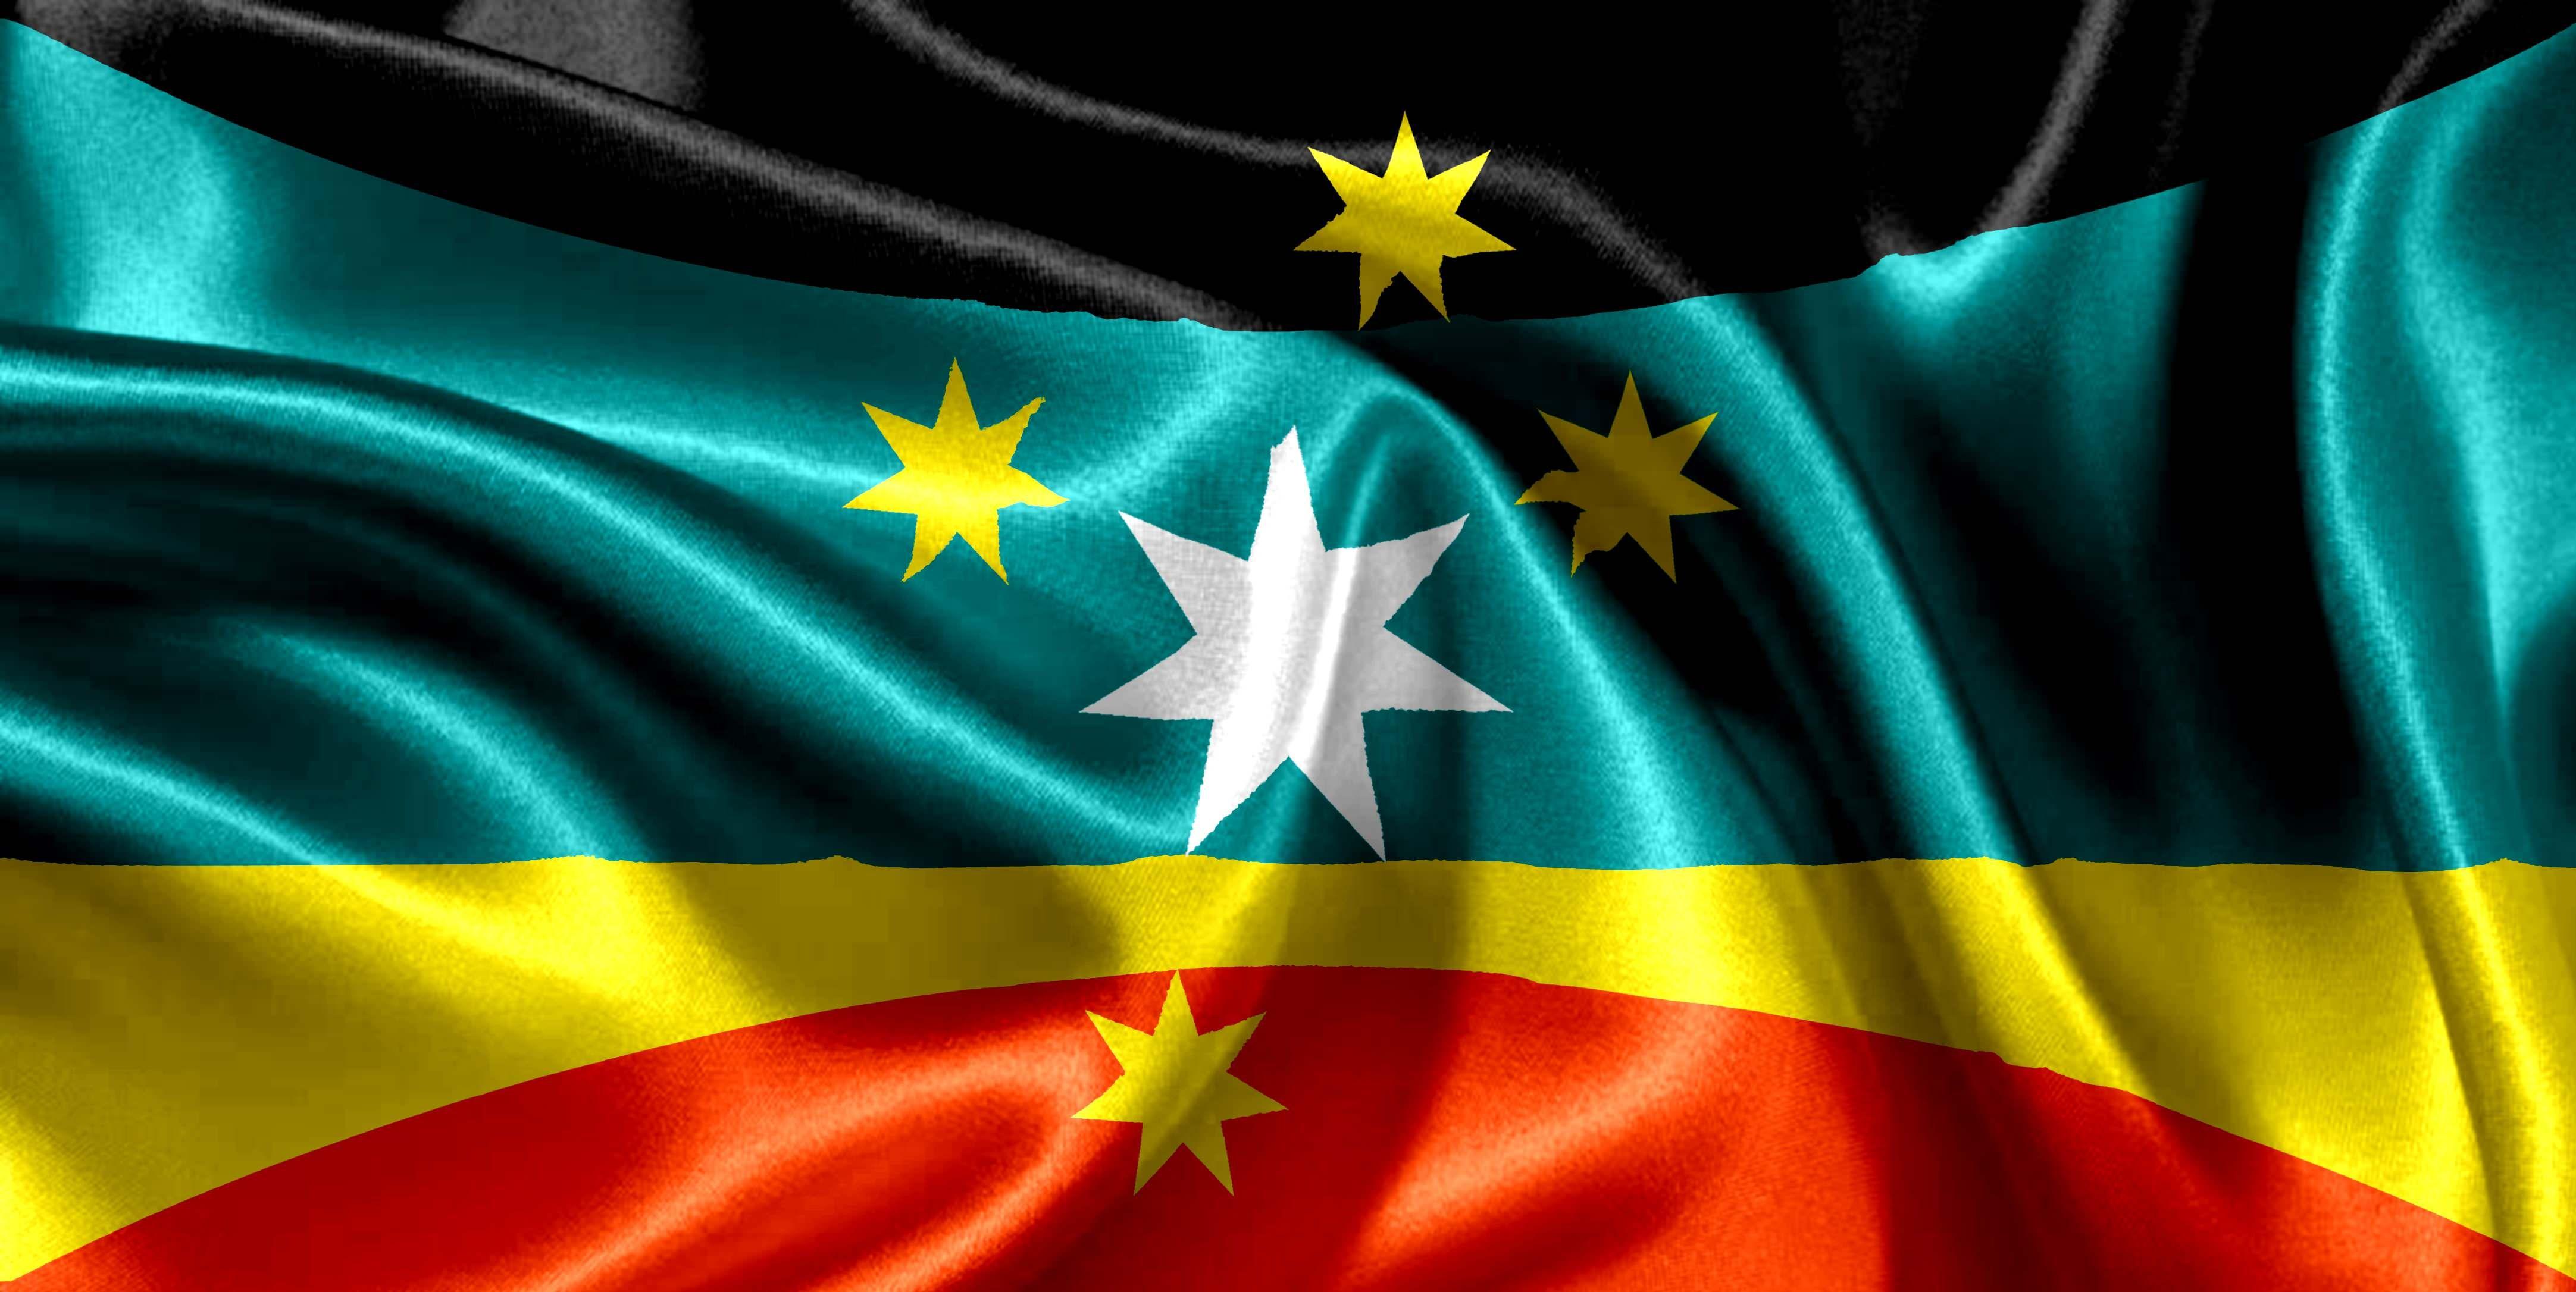 new Australian Flag design series - UluruSky17-GGoldHorizon-SC-CS ...